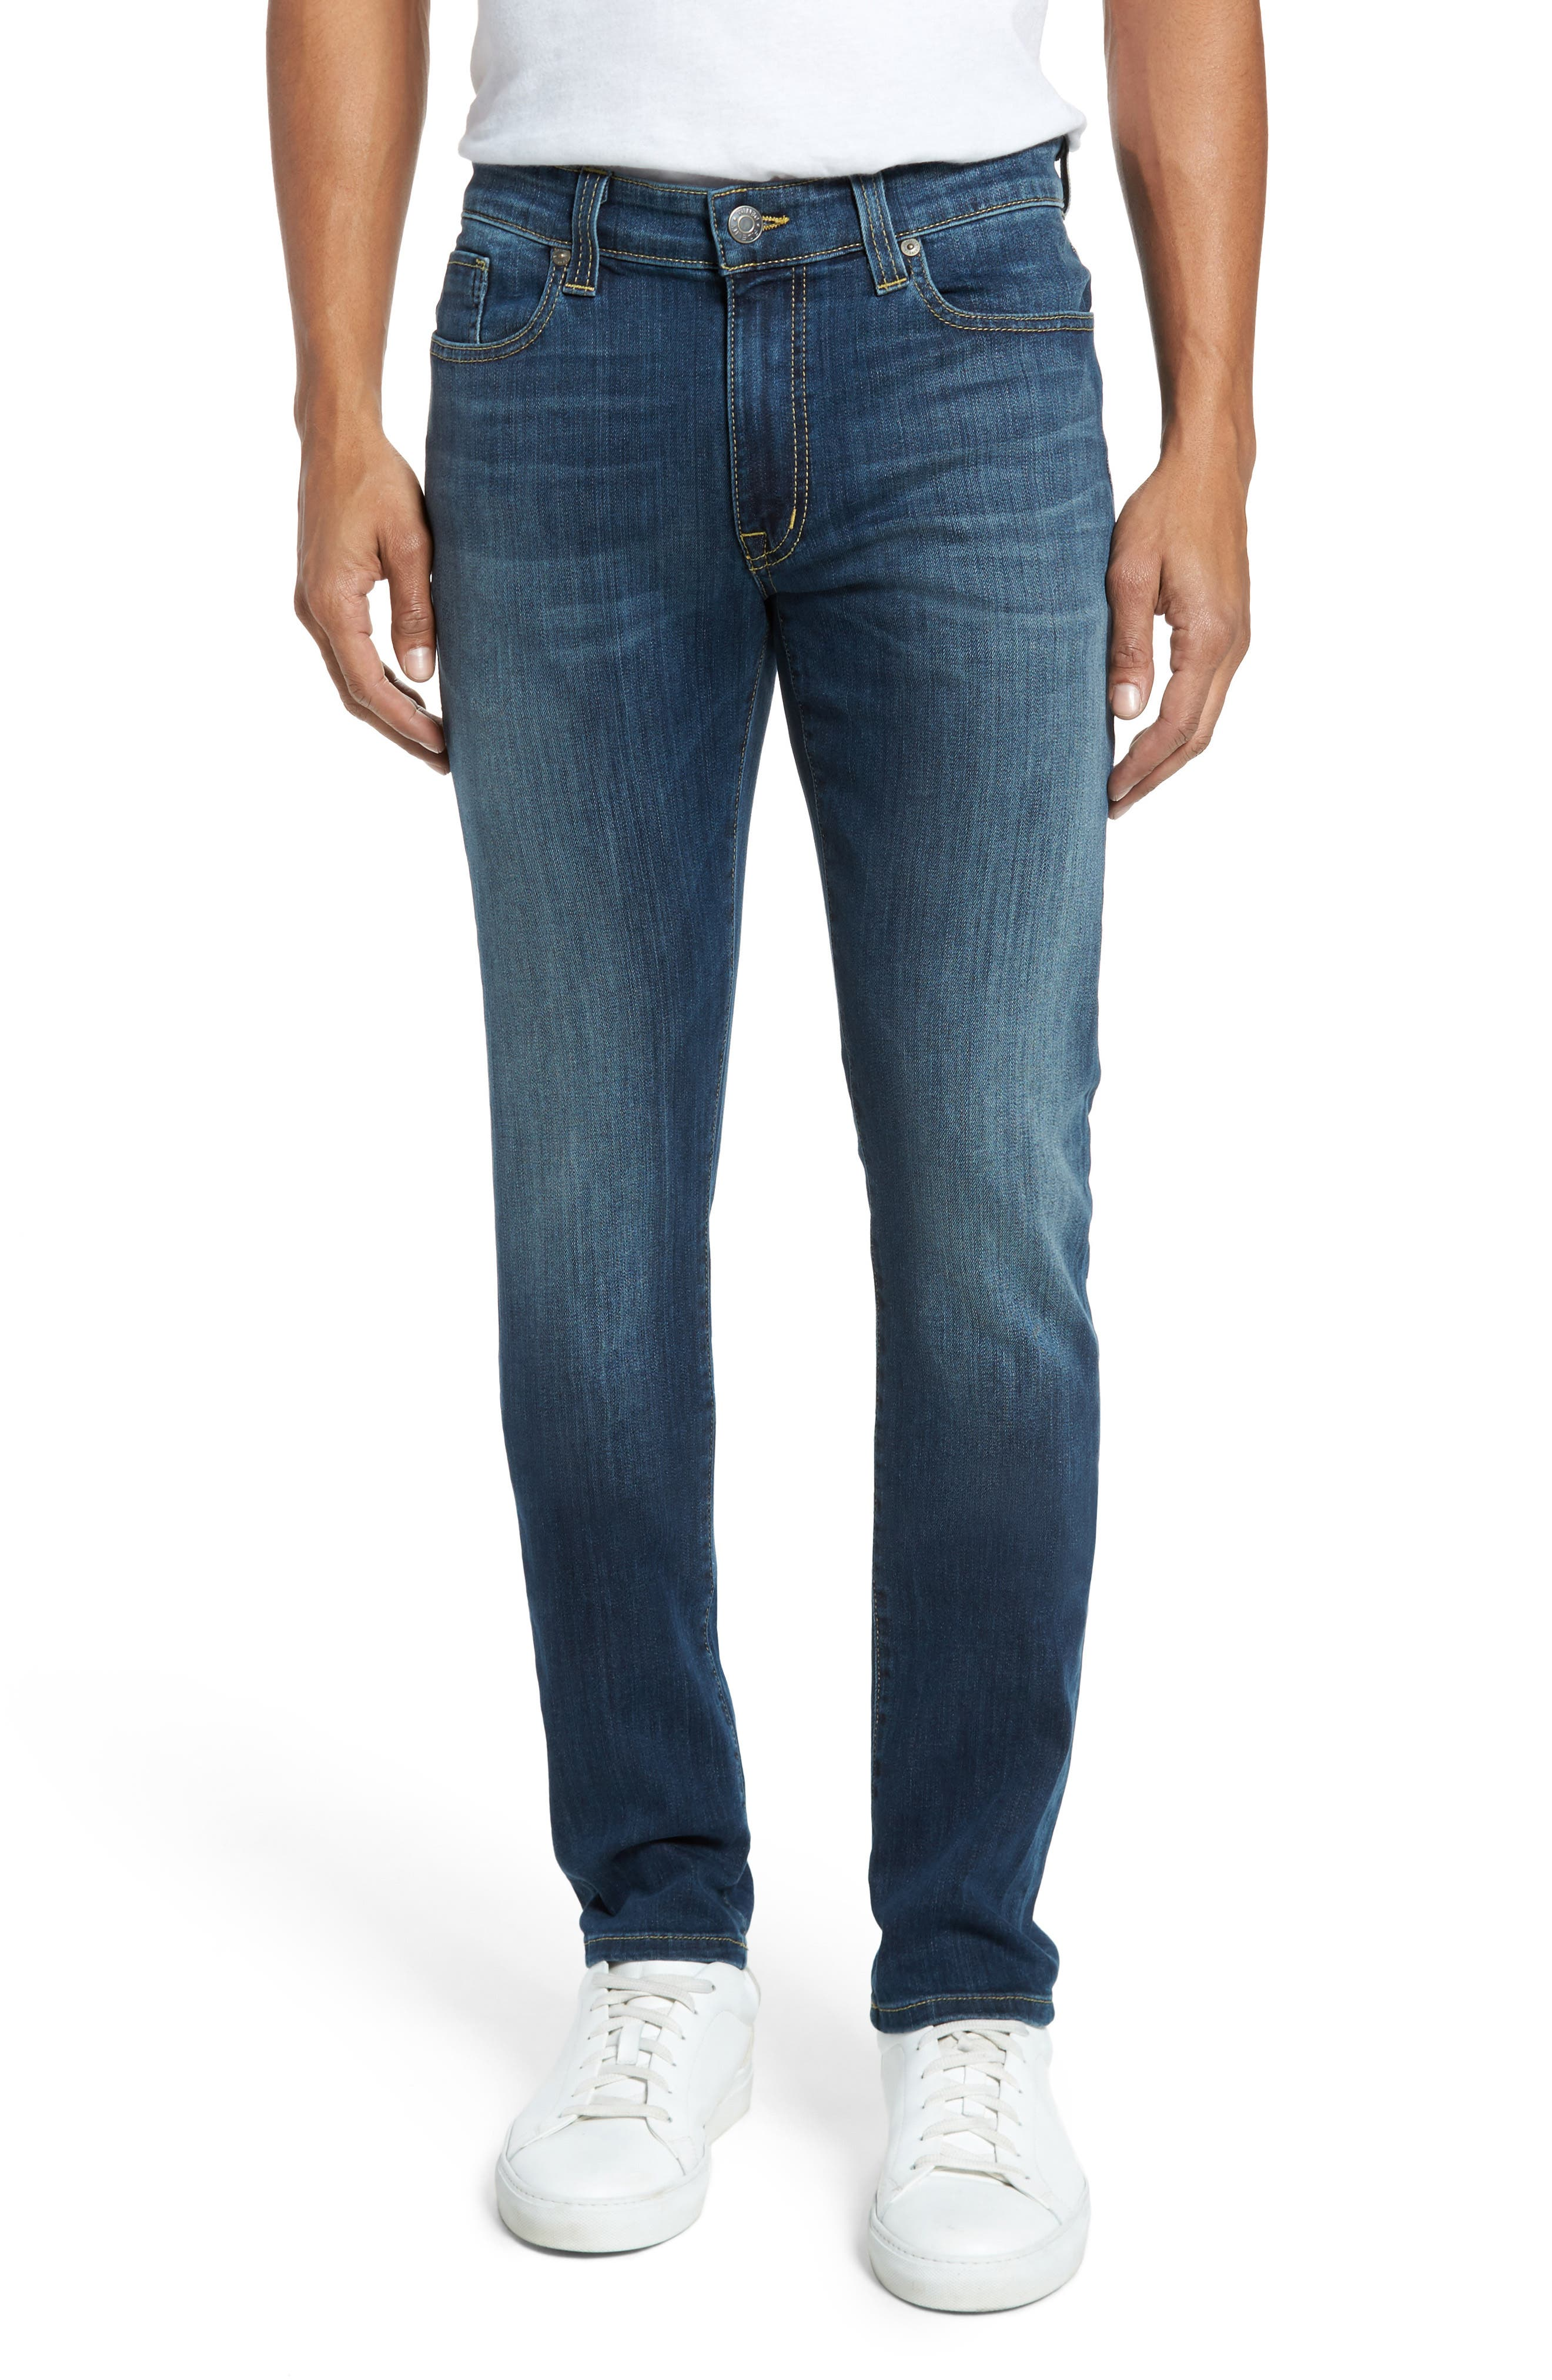 Alternate Image 1 Selected - Fidelity Denim Torino Slim Fit Jeans (Providence)